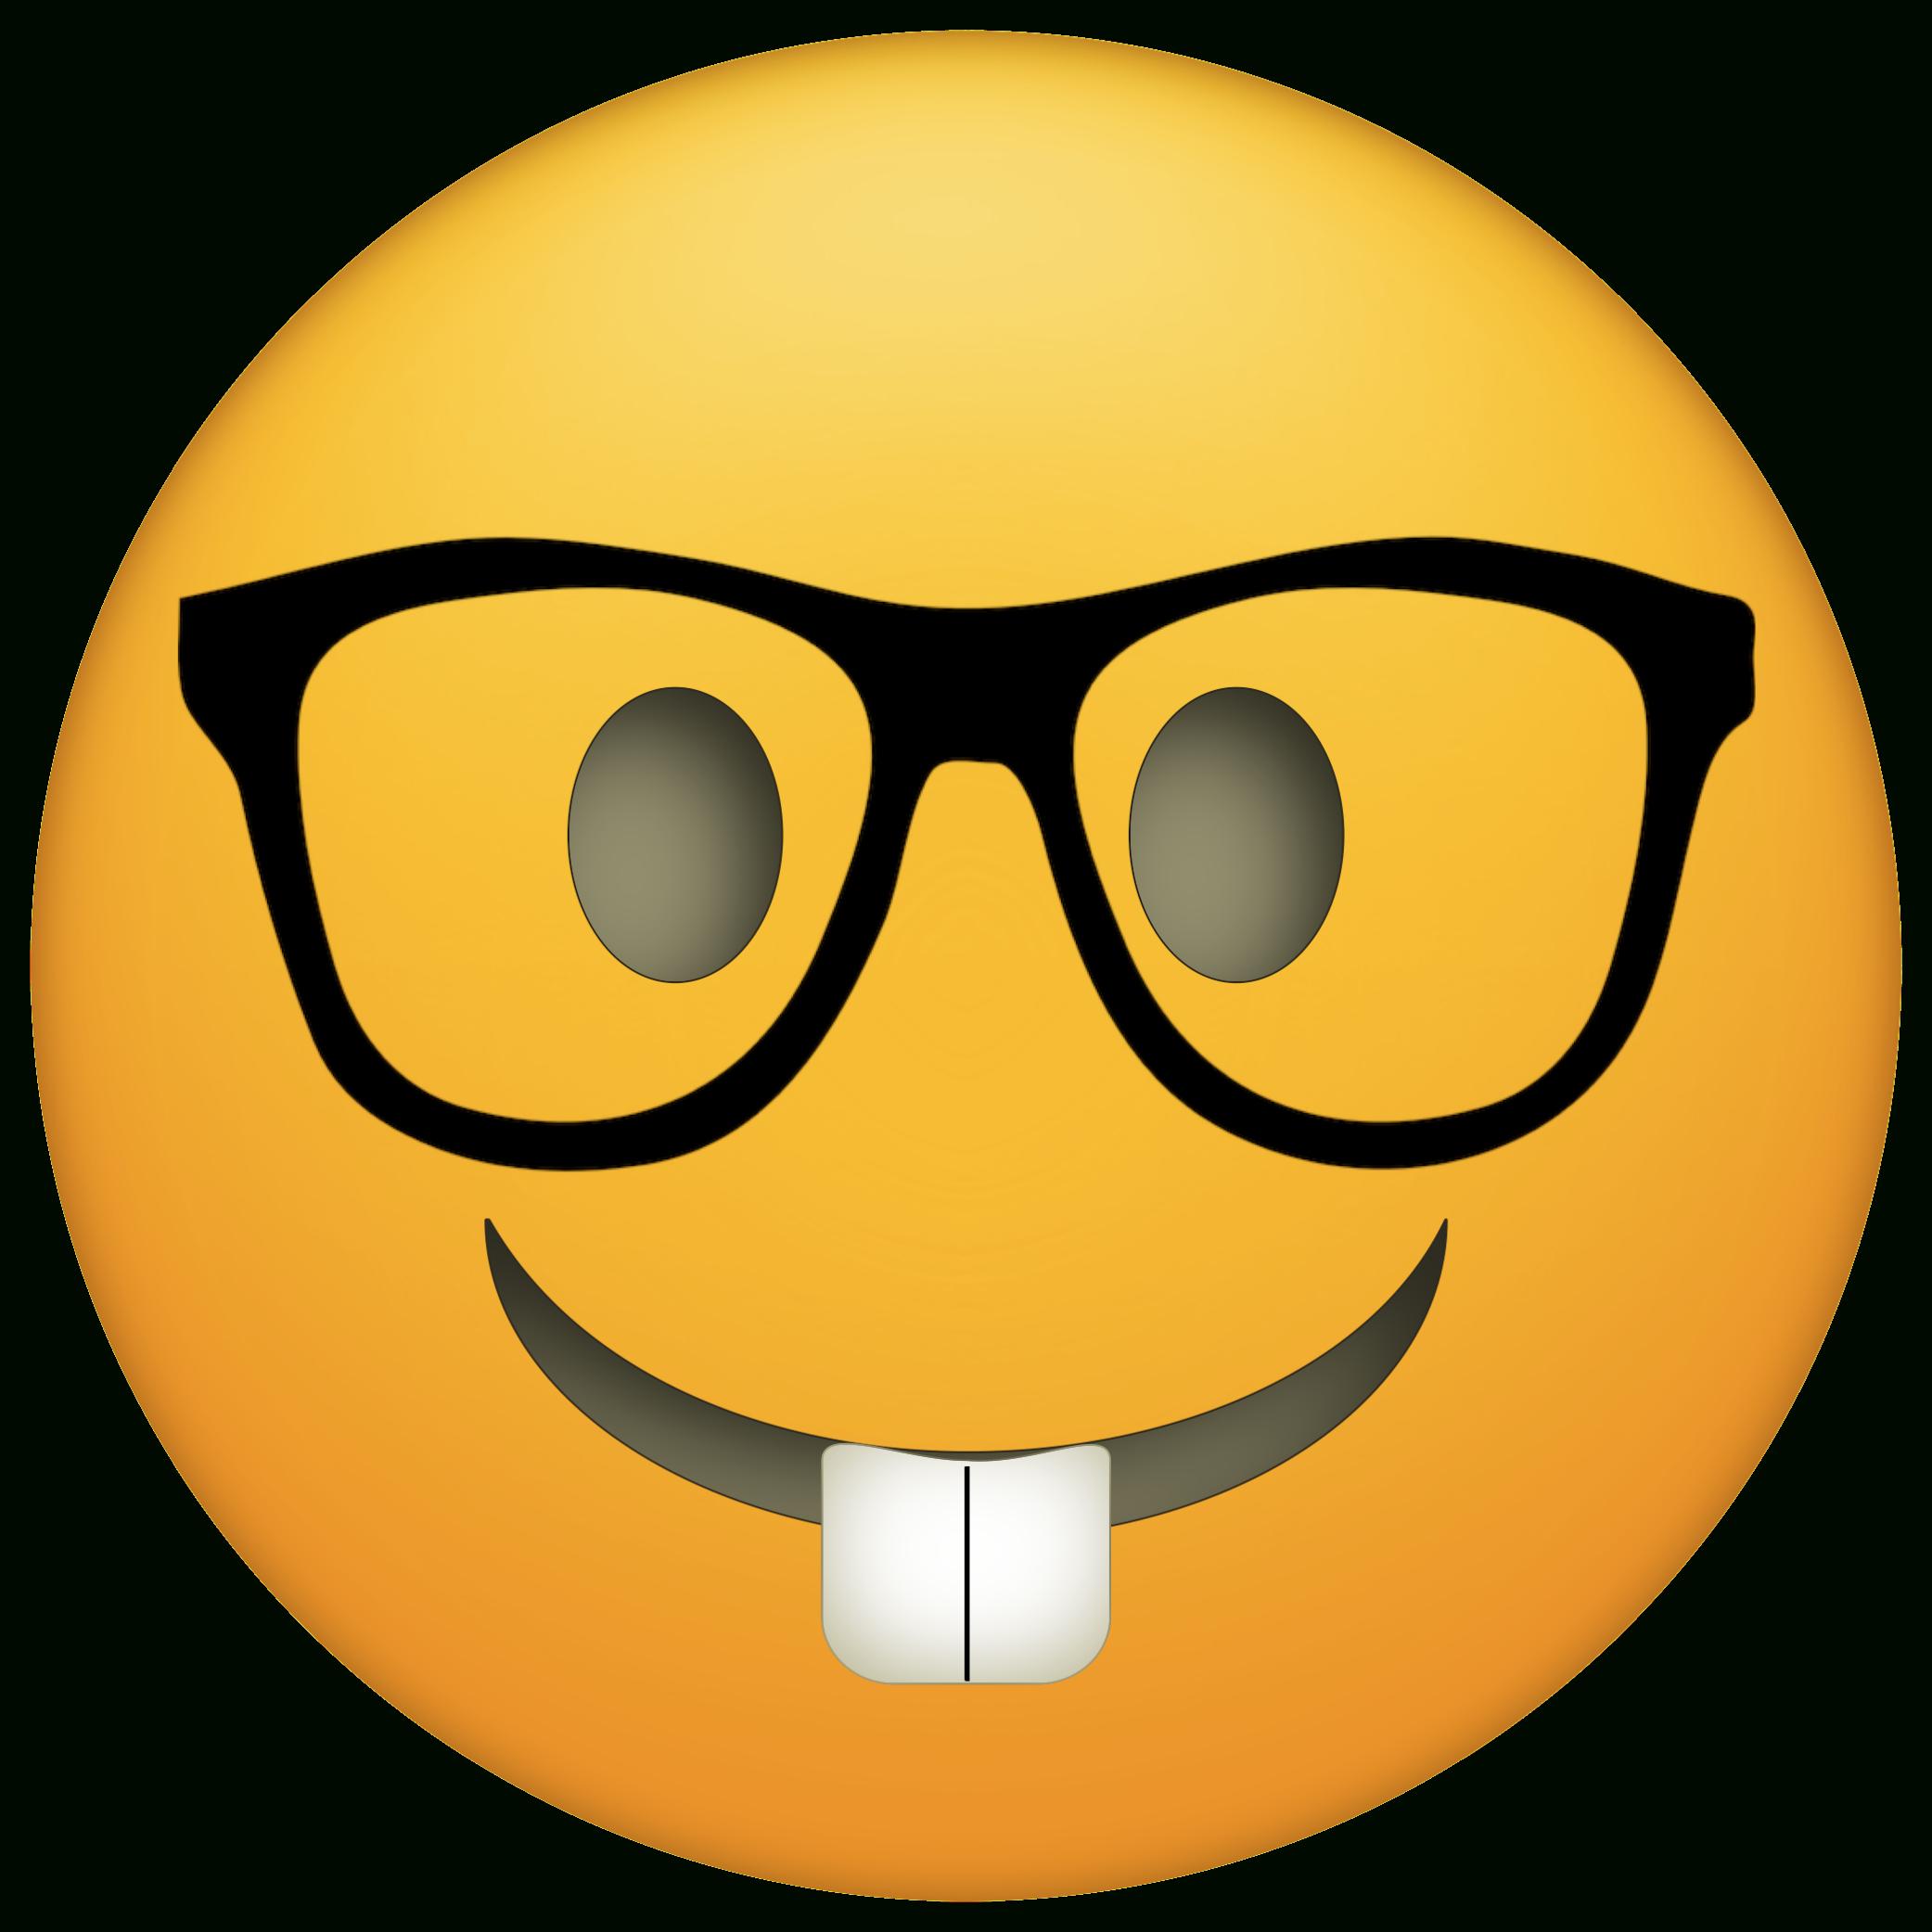 44 Awesome Printable Emojis | Kittybabylove - Free Emoji Printables